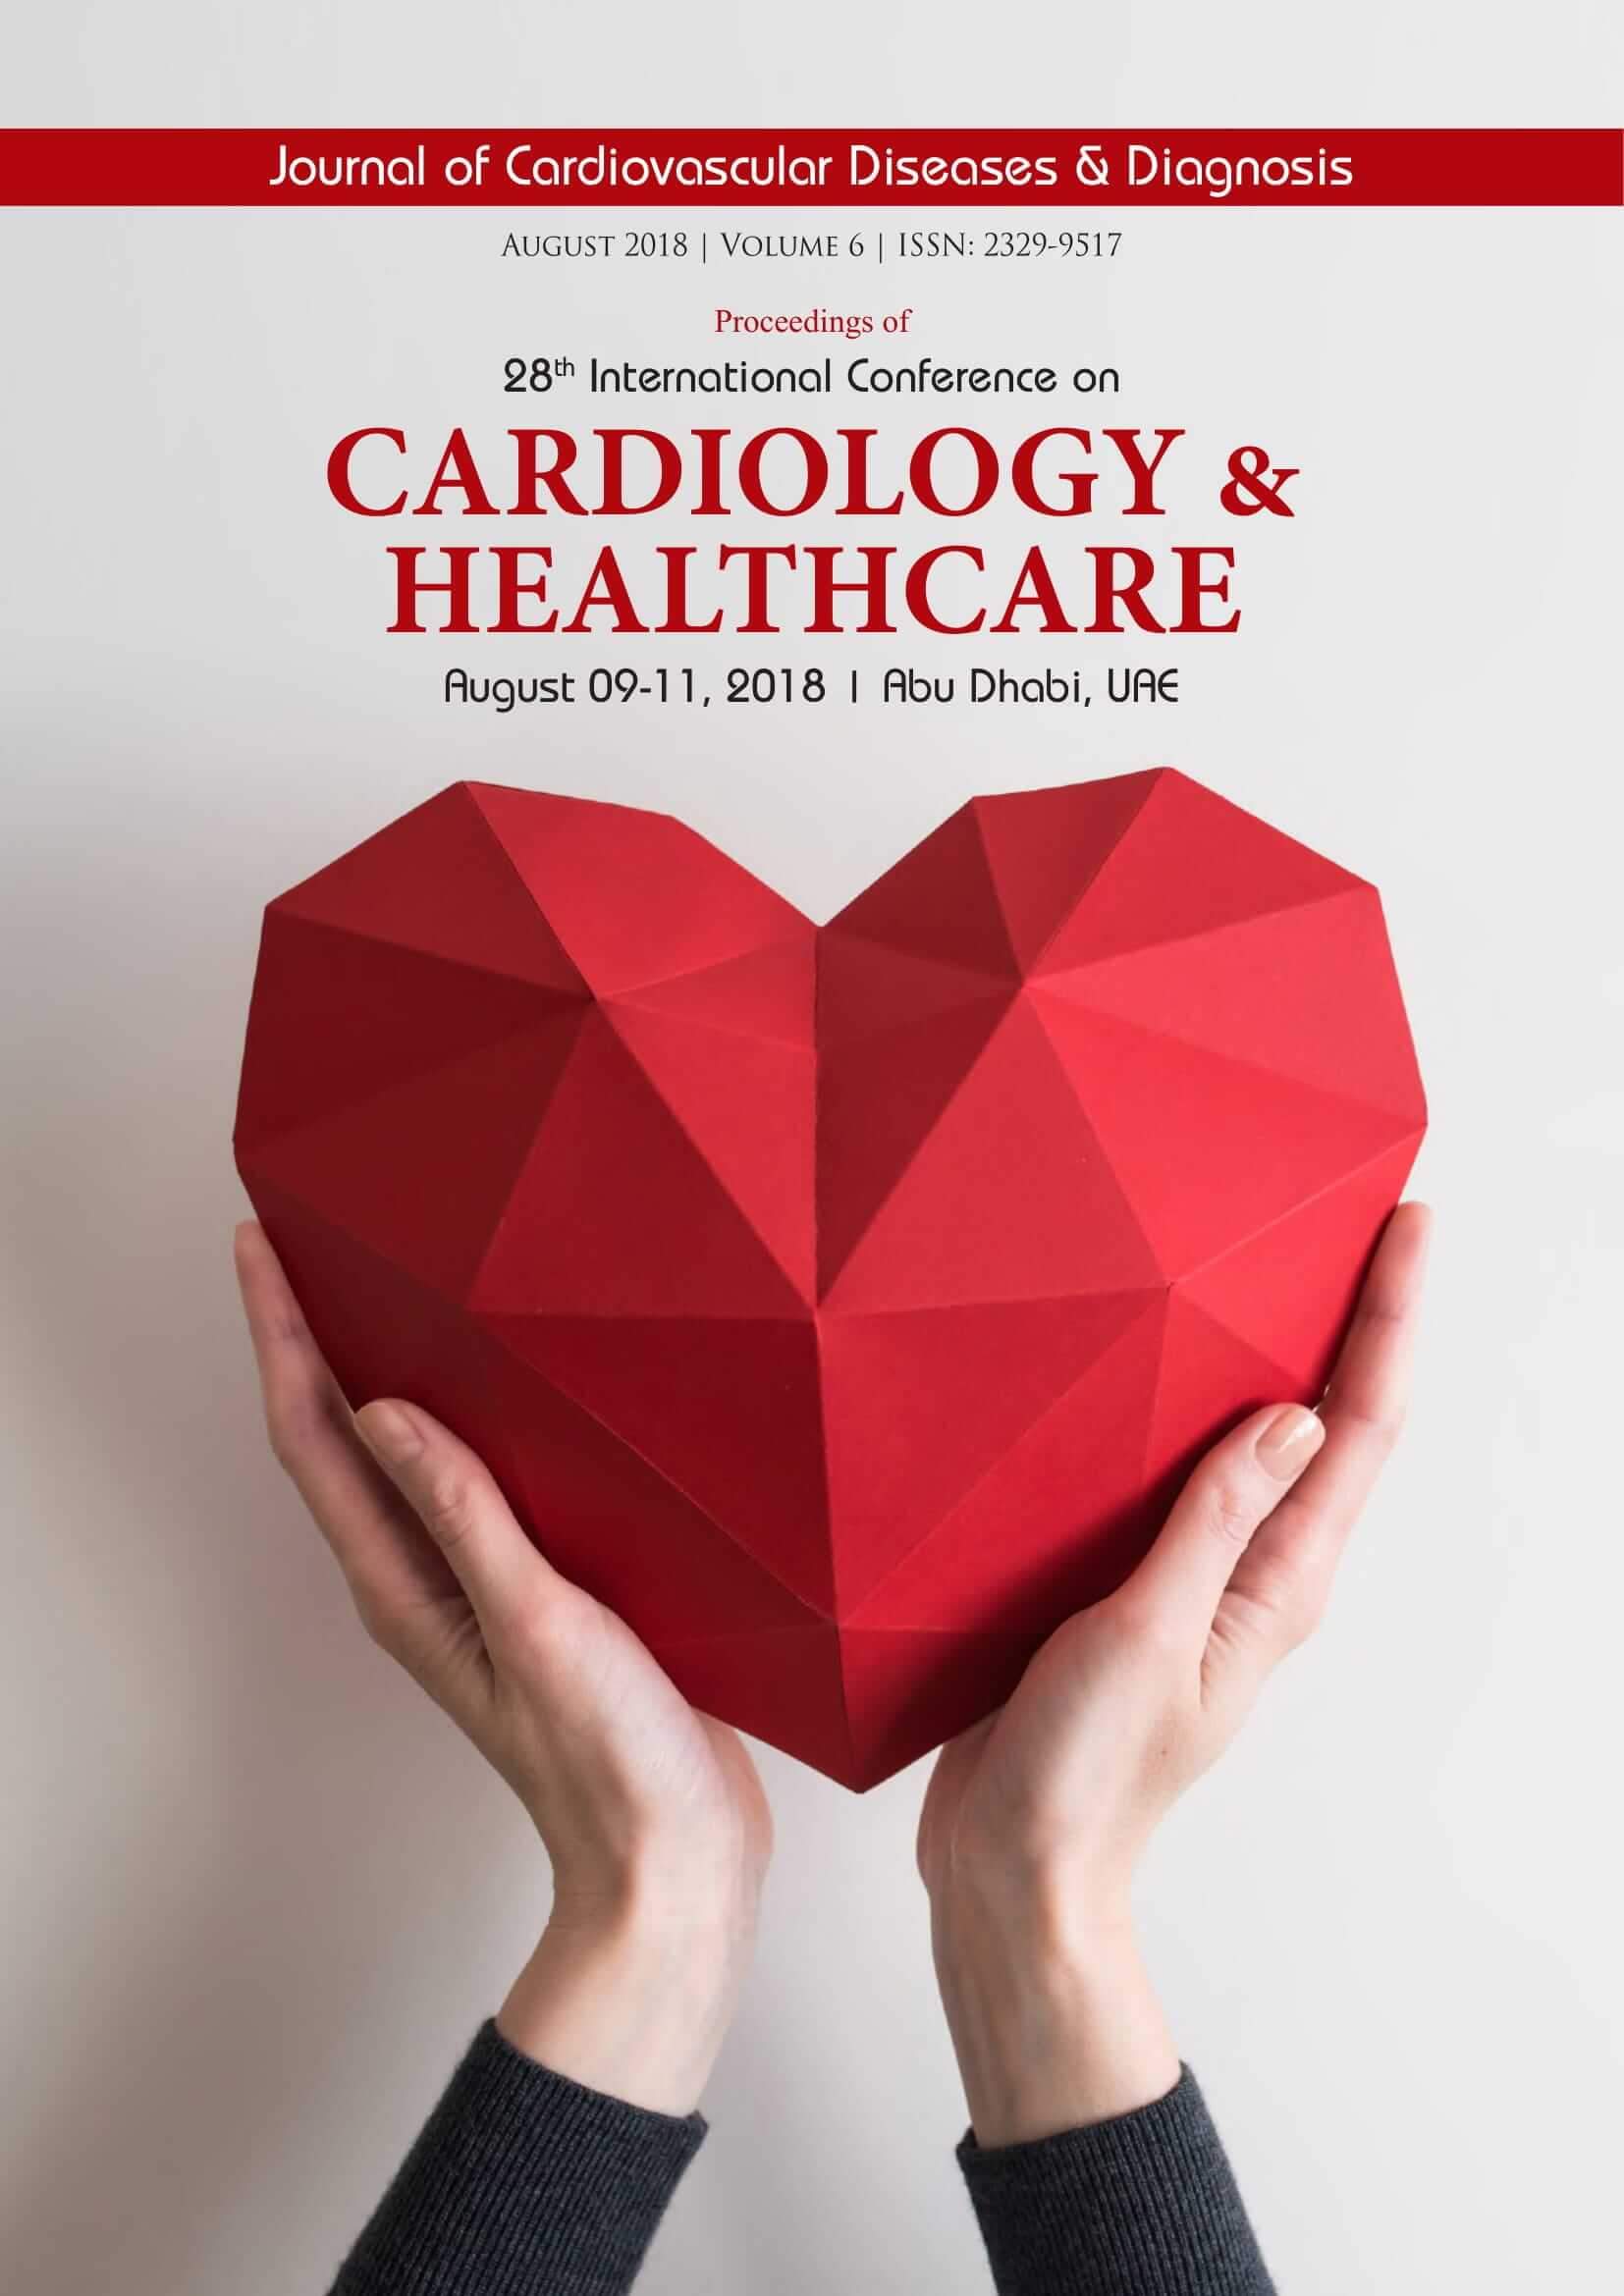 Journal of Cardiovascular Diseases & Diagnosis